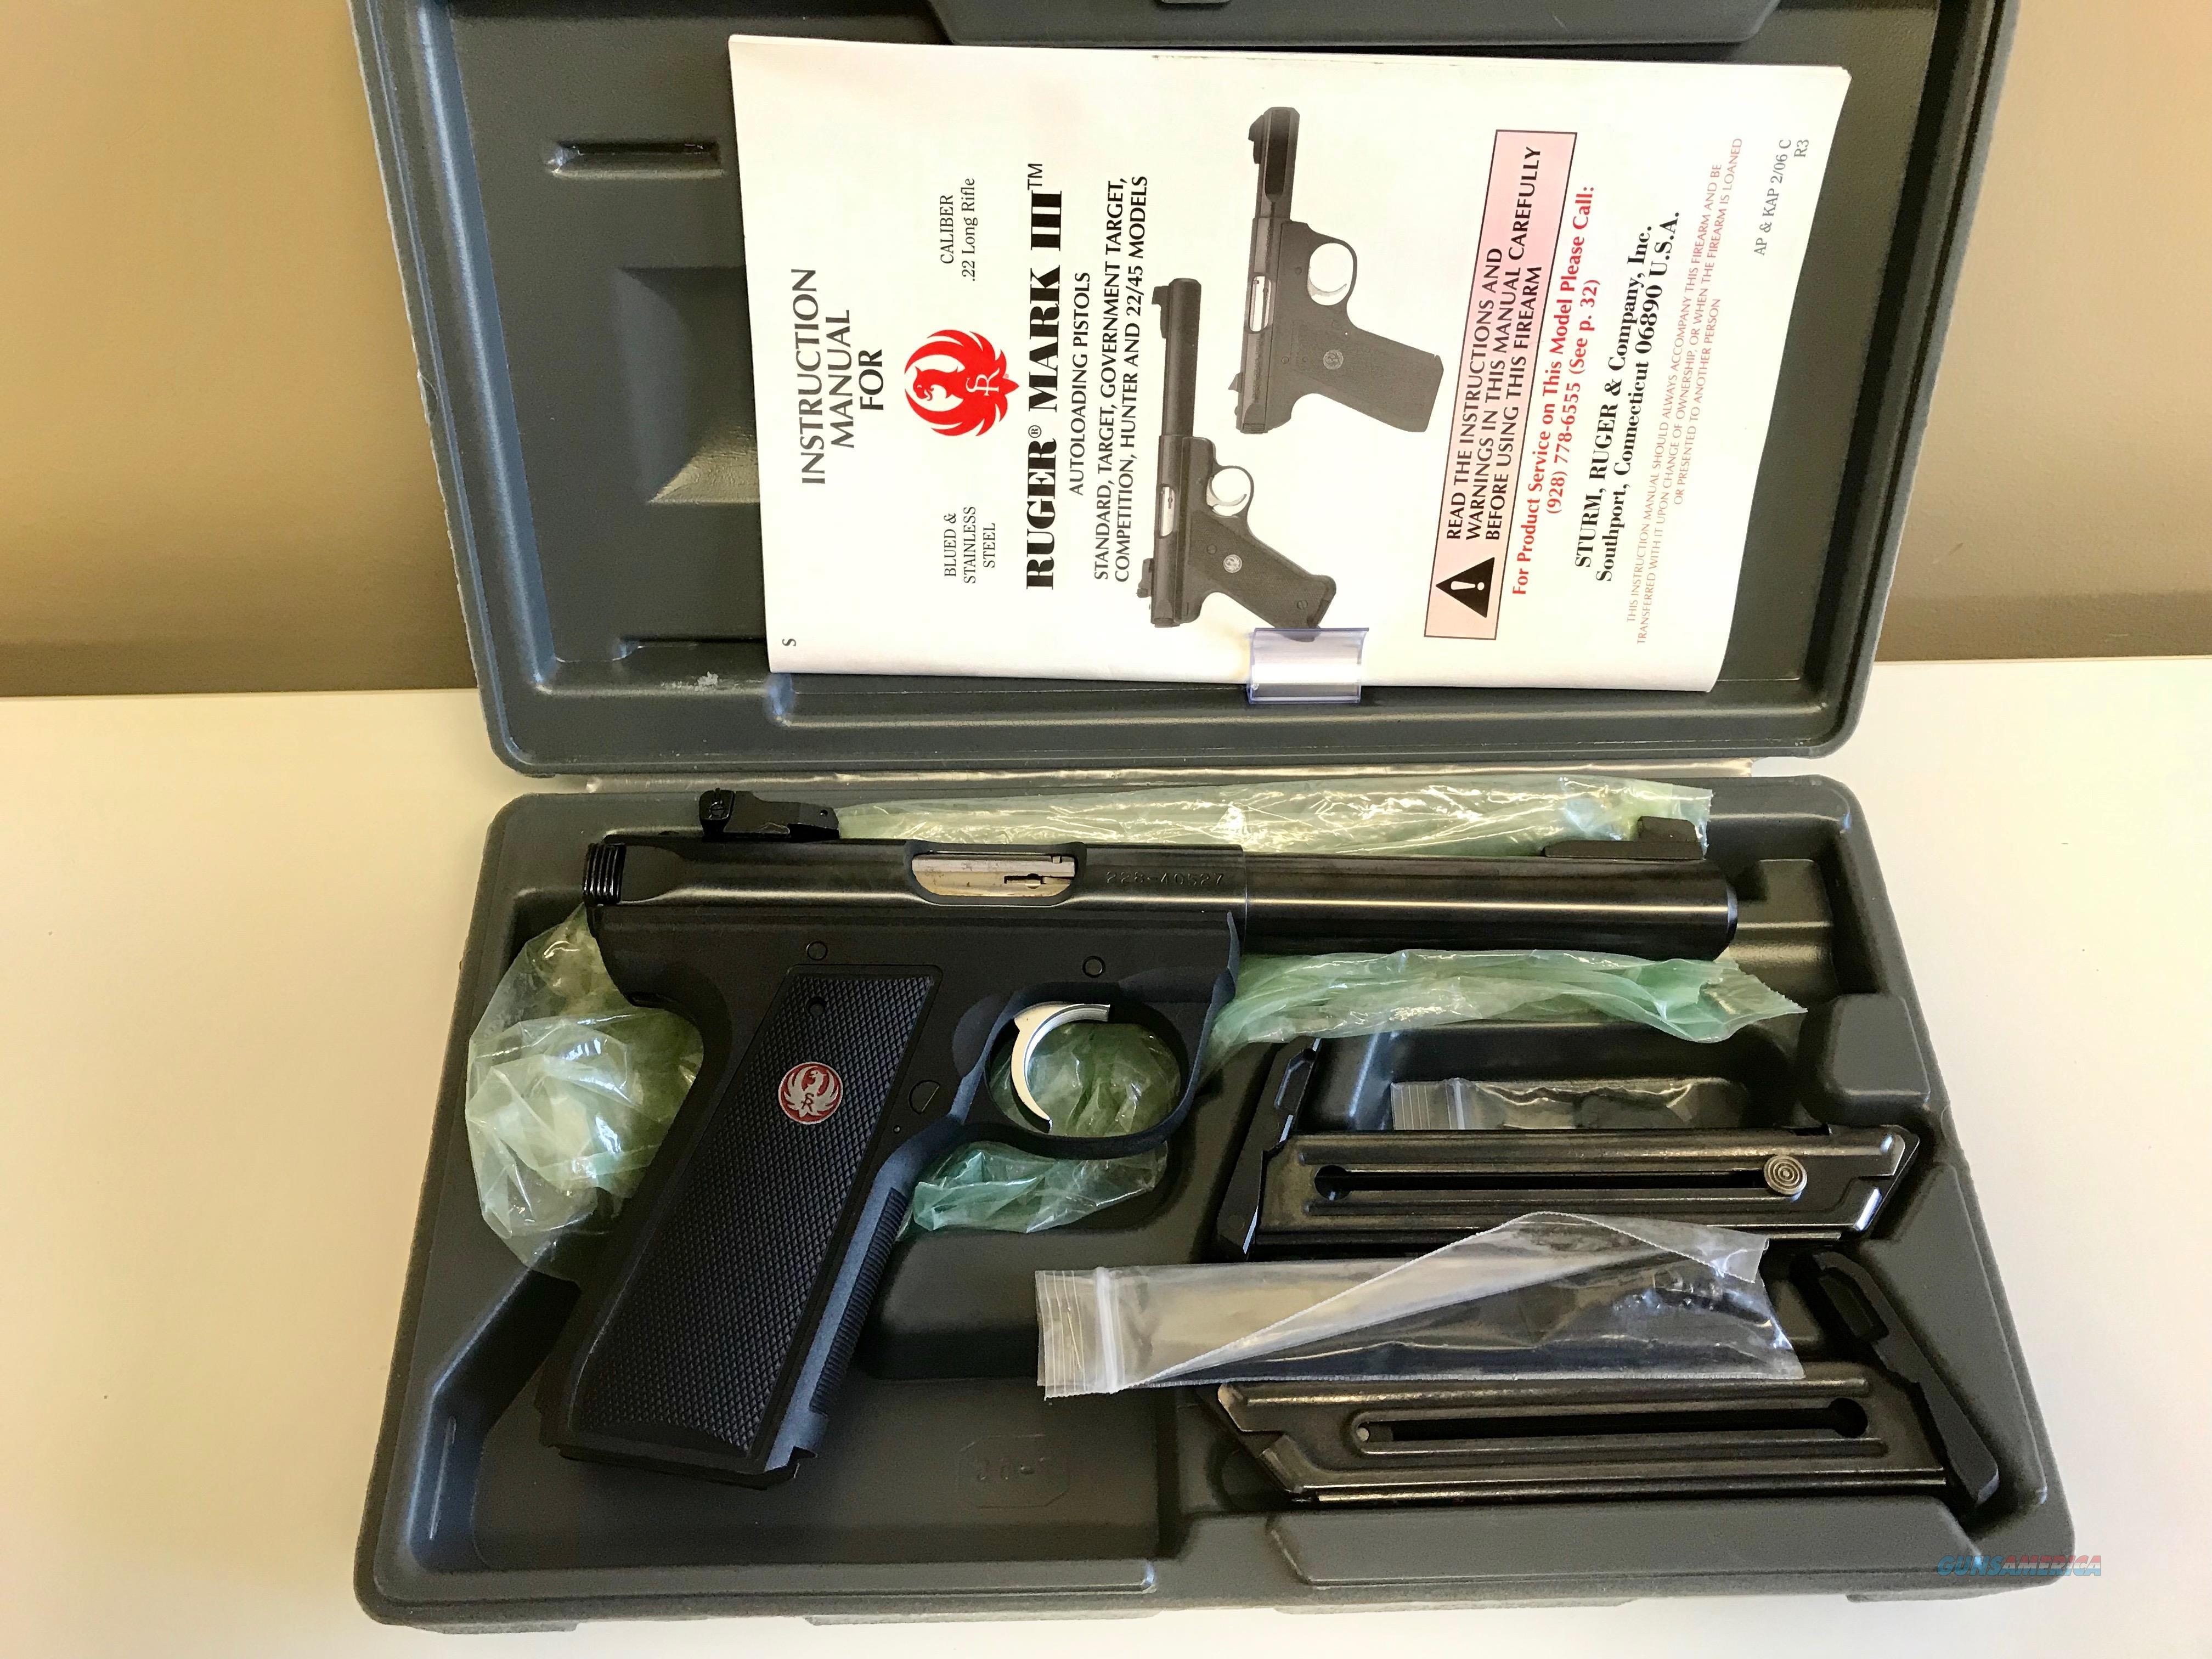 Used Ruger Mark III 22LR  Guns > Pistols > Ruger Semi-Auto Pistols > Mark I/II/III/IV Family